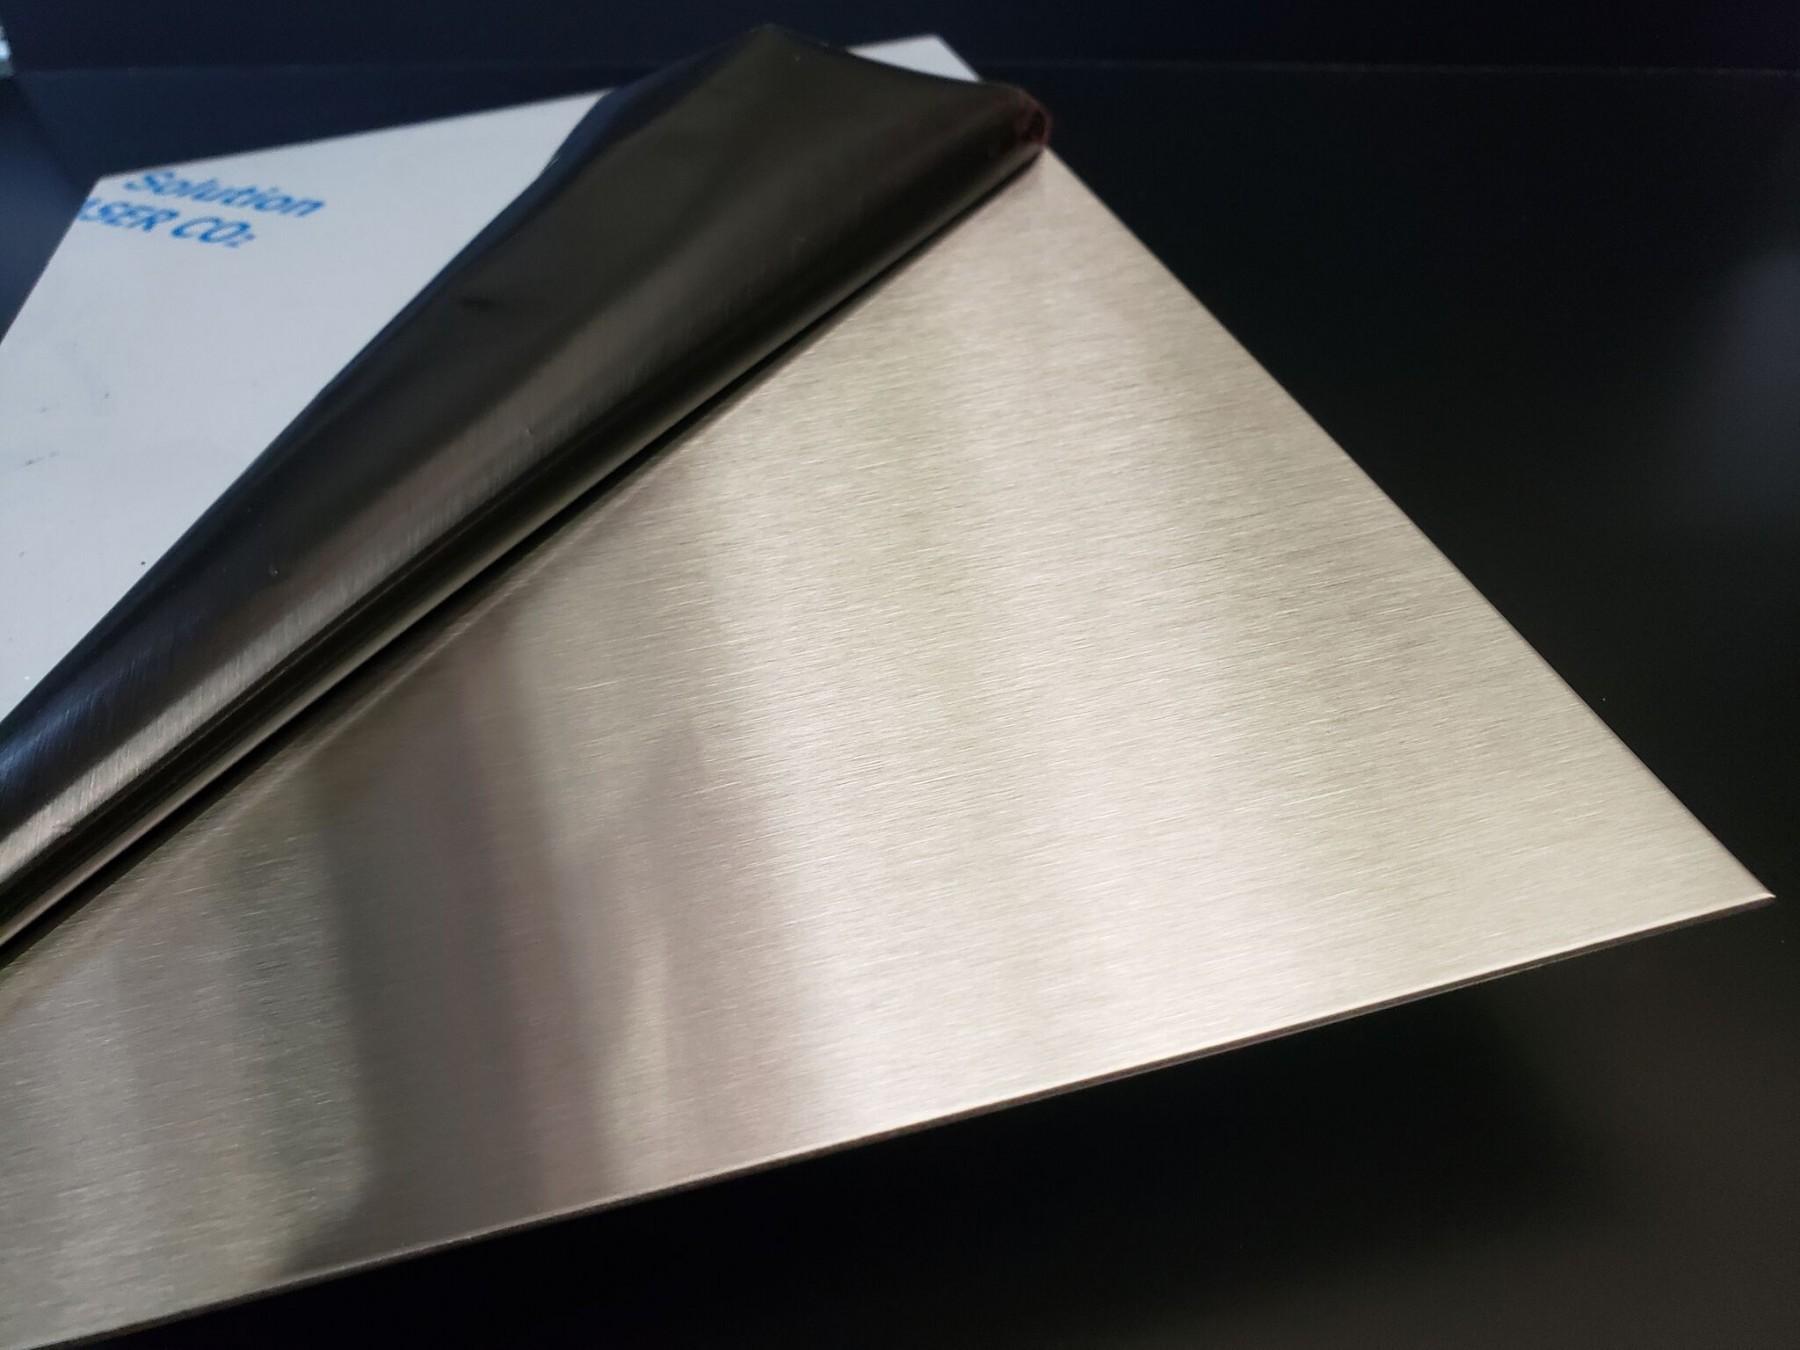 Stainless Steel Flat Stock Grade 304 Sheet Metals Online